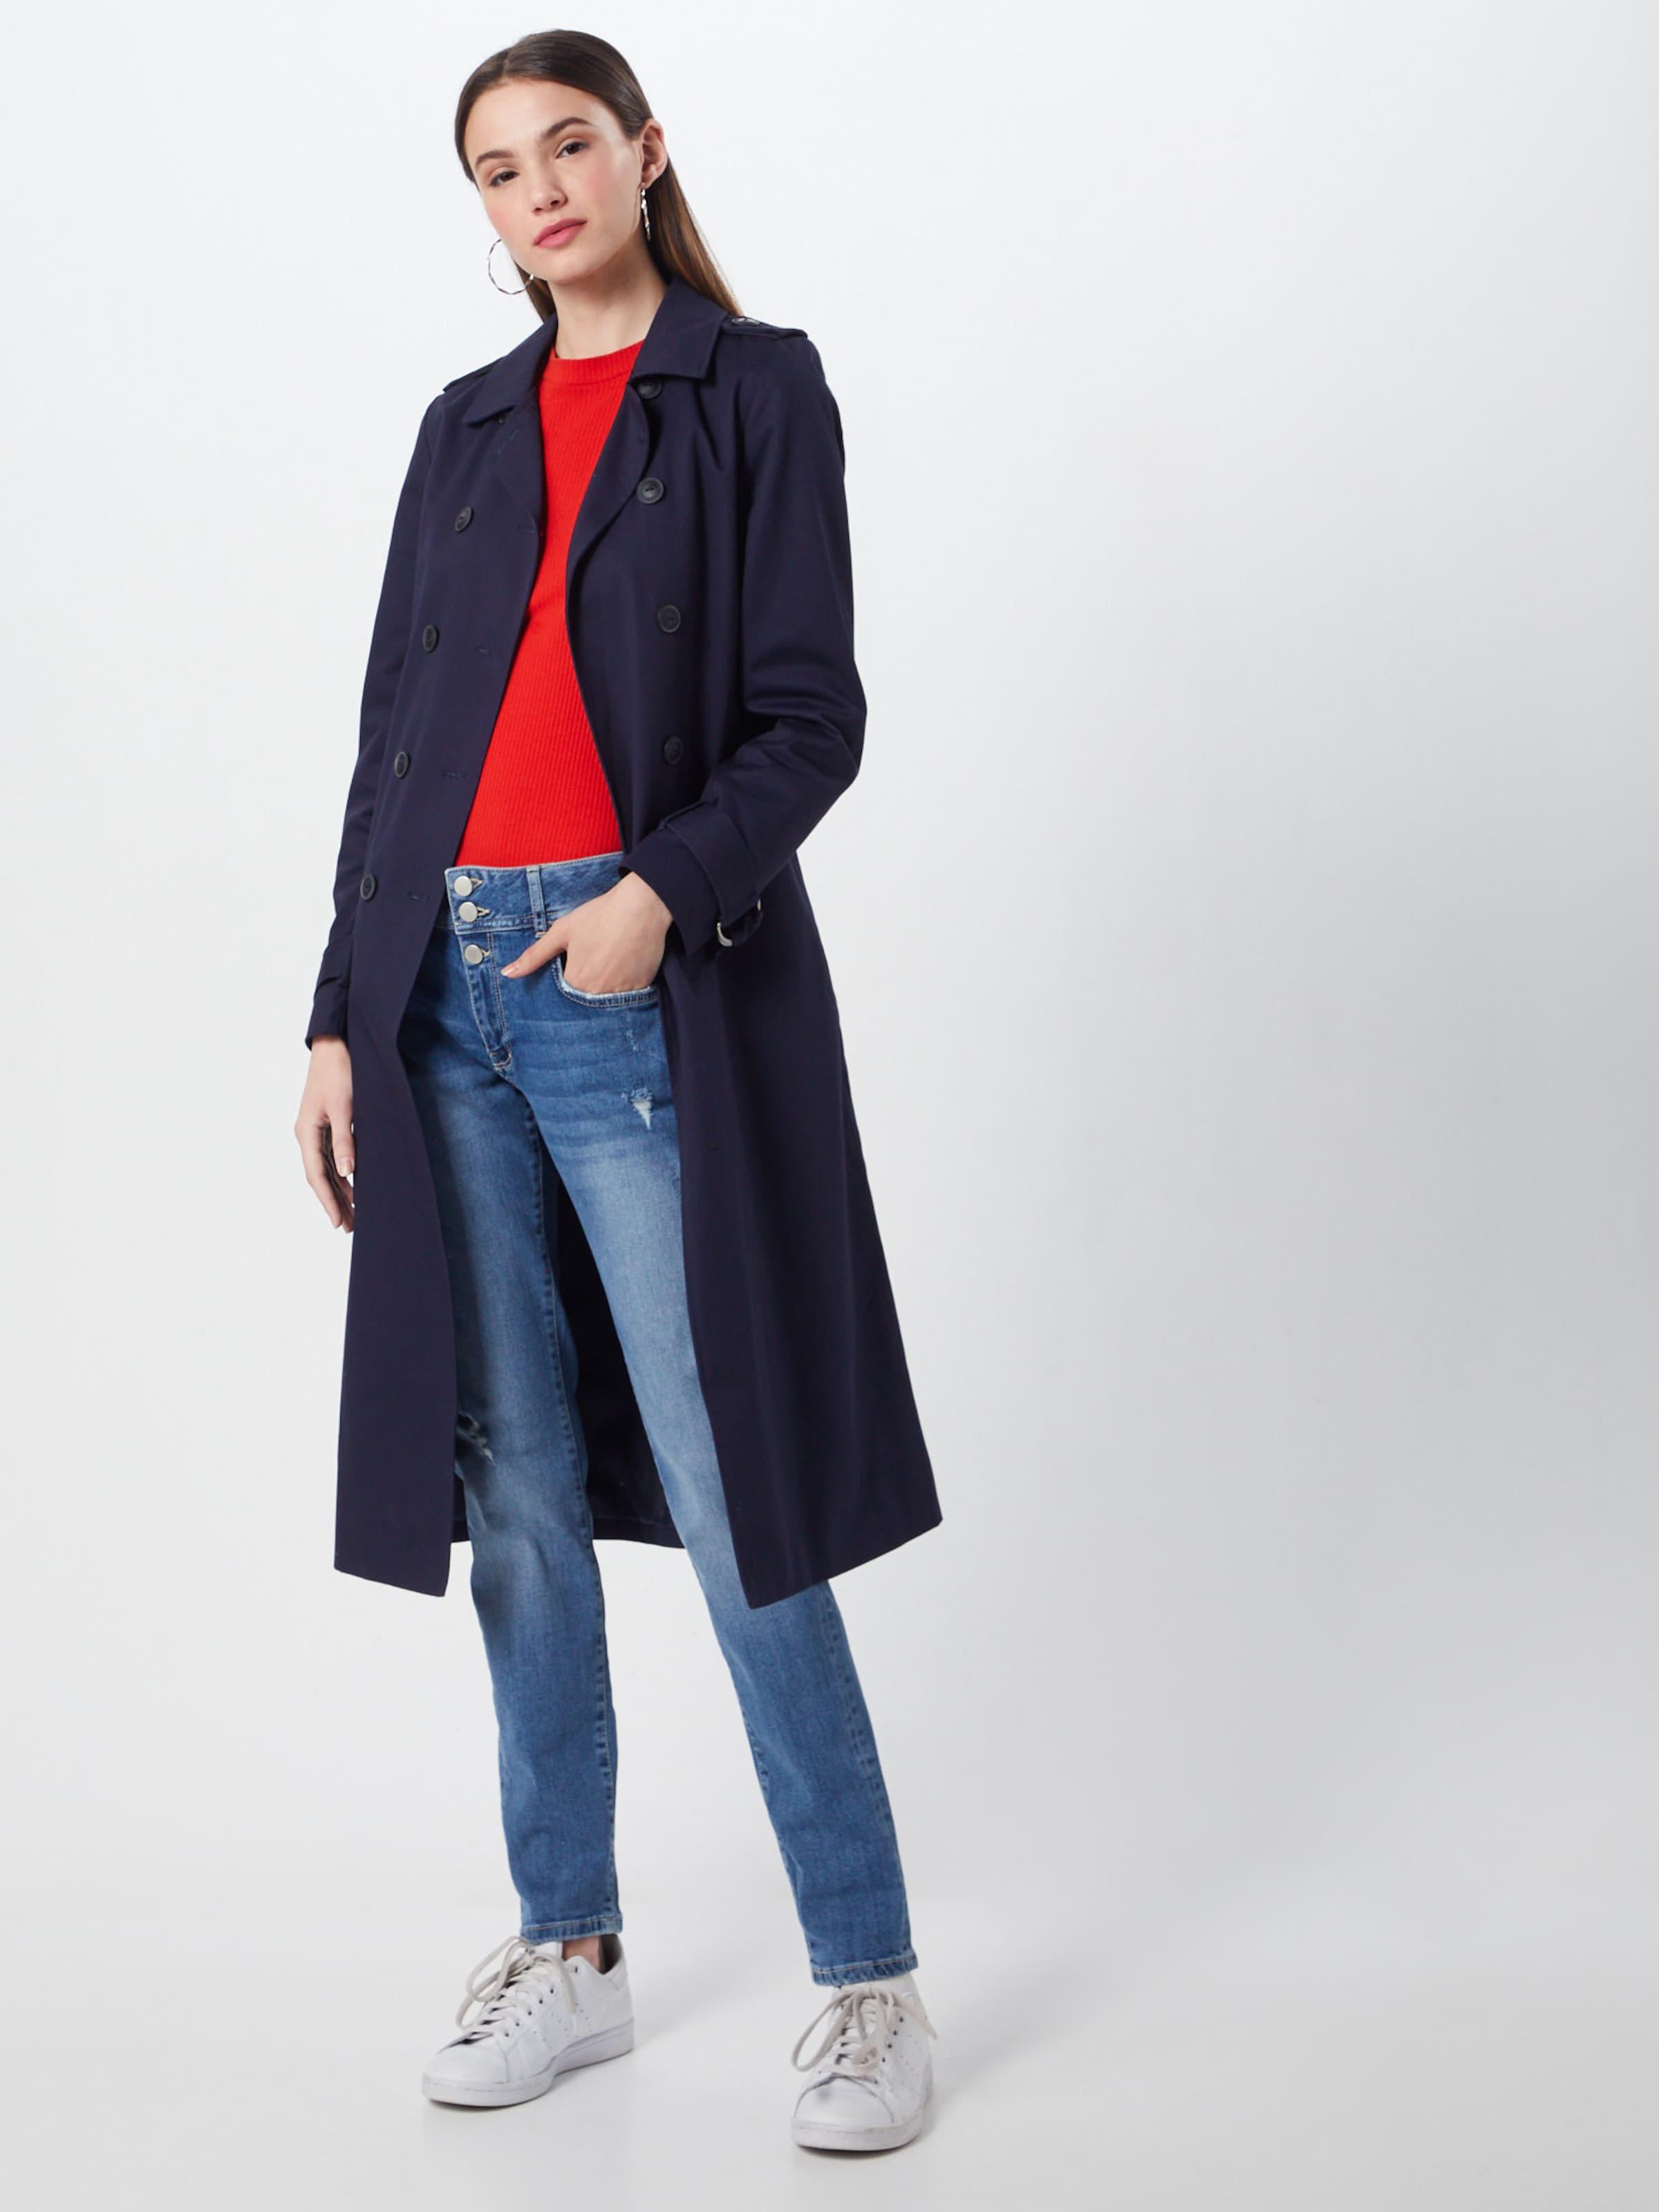 Q Boyfriend Denim s In Blue Jeans By Designed R54jL3A